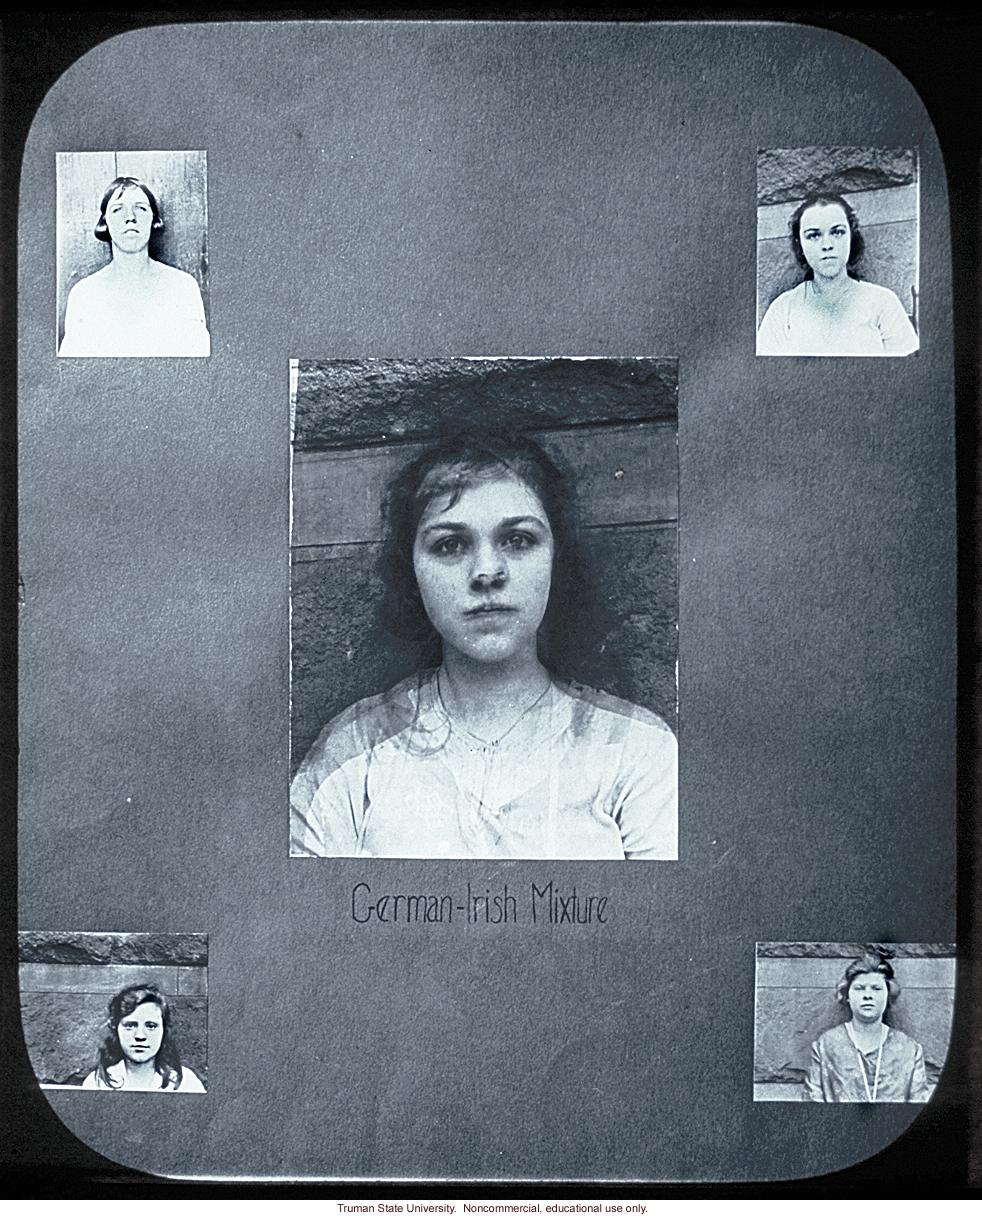 &quote;German-Irish mixture,&quote; composite portrait in the style of Franics Galton